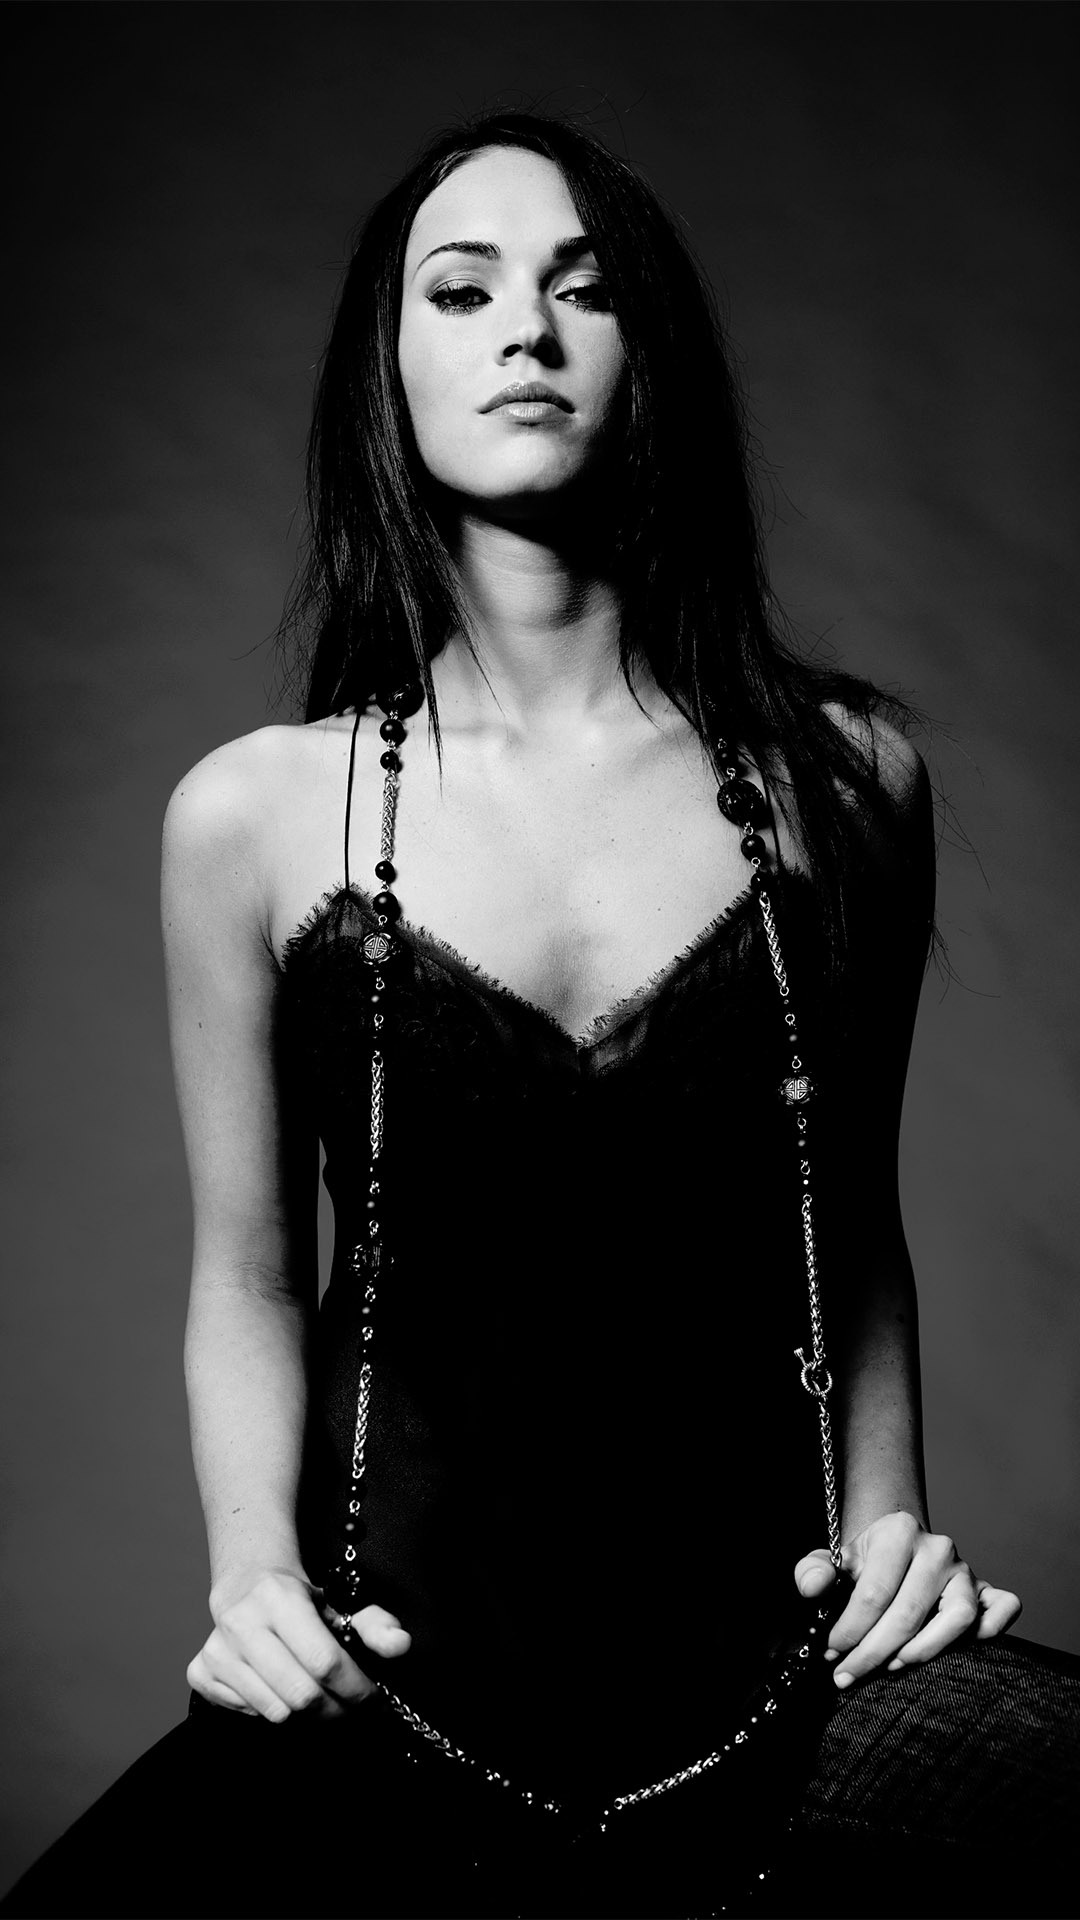 Artistic photo Megan Fox